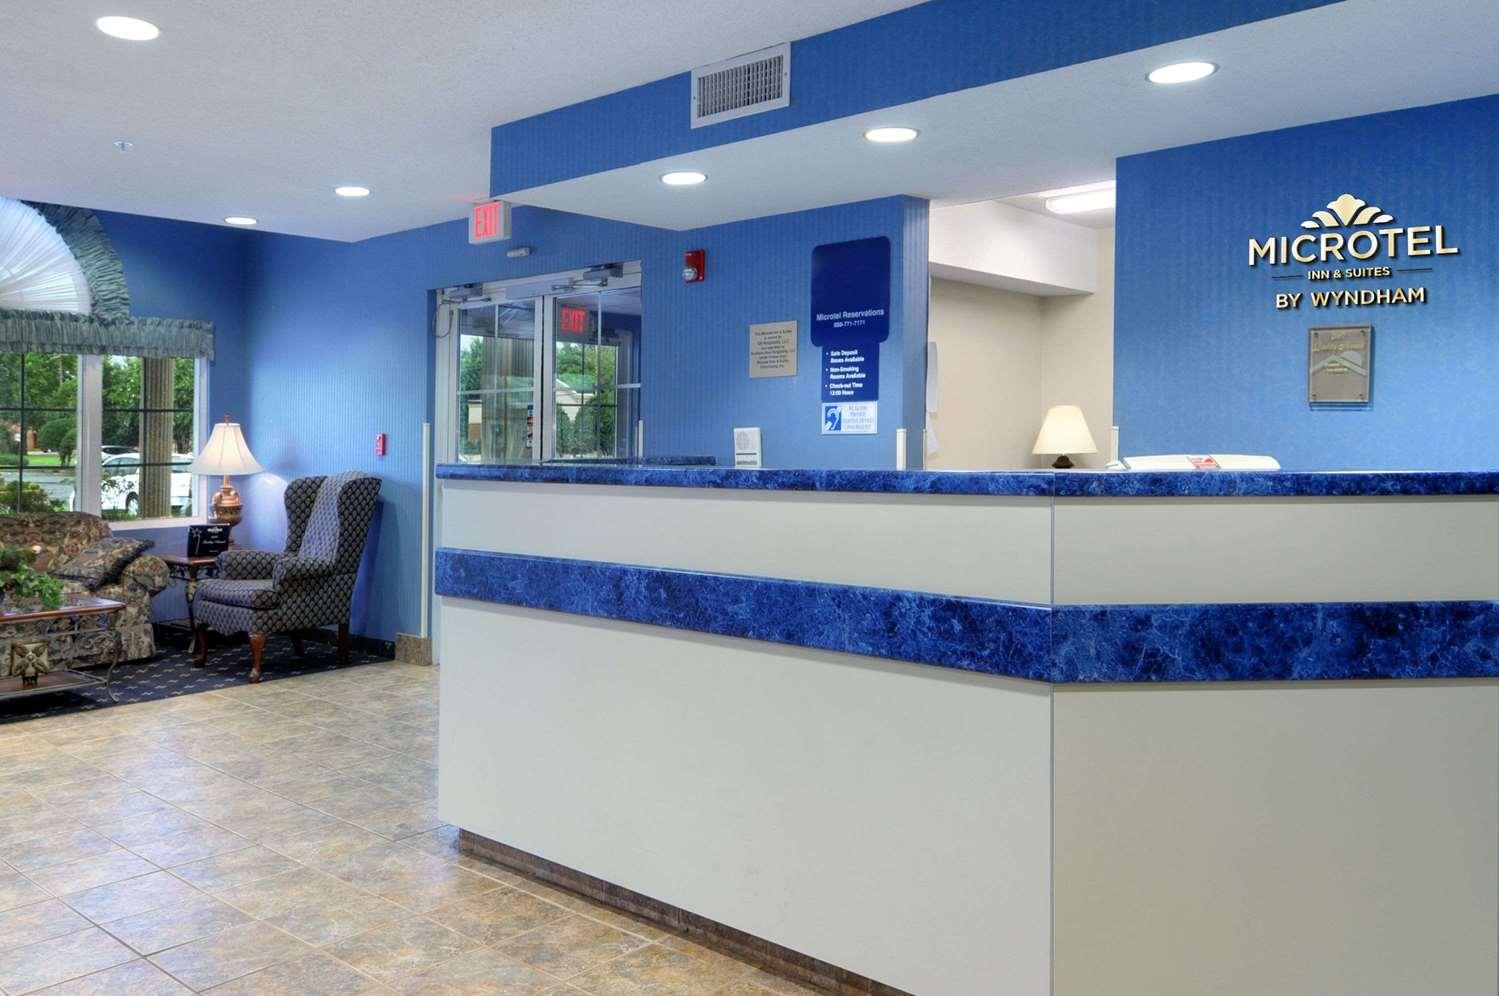 Lobby - Microtel Inn & Suites by Wyndham Bossier City